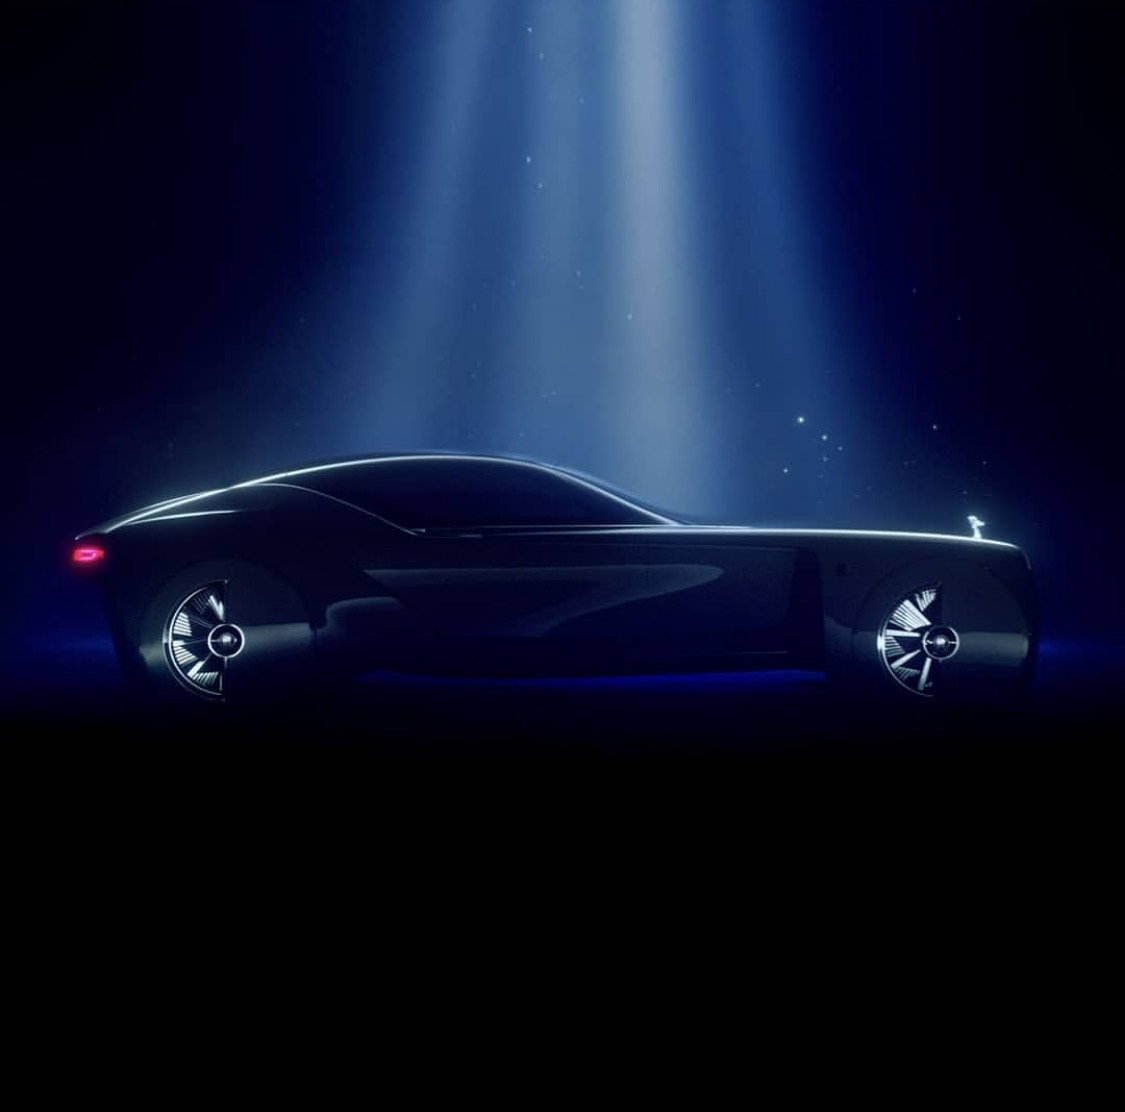 Meet the retro-futuristic Rolls-Royce Exterion